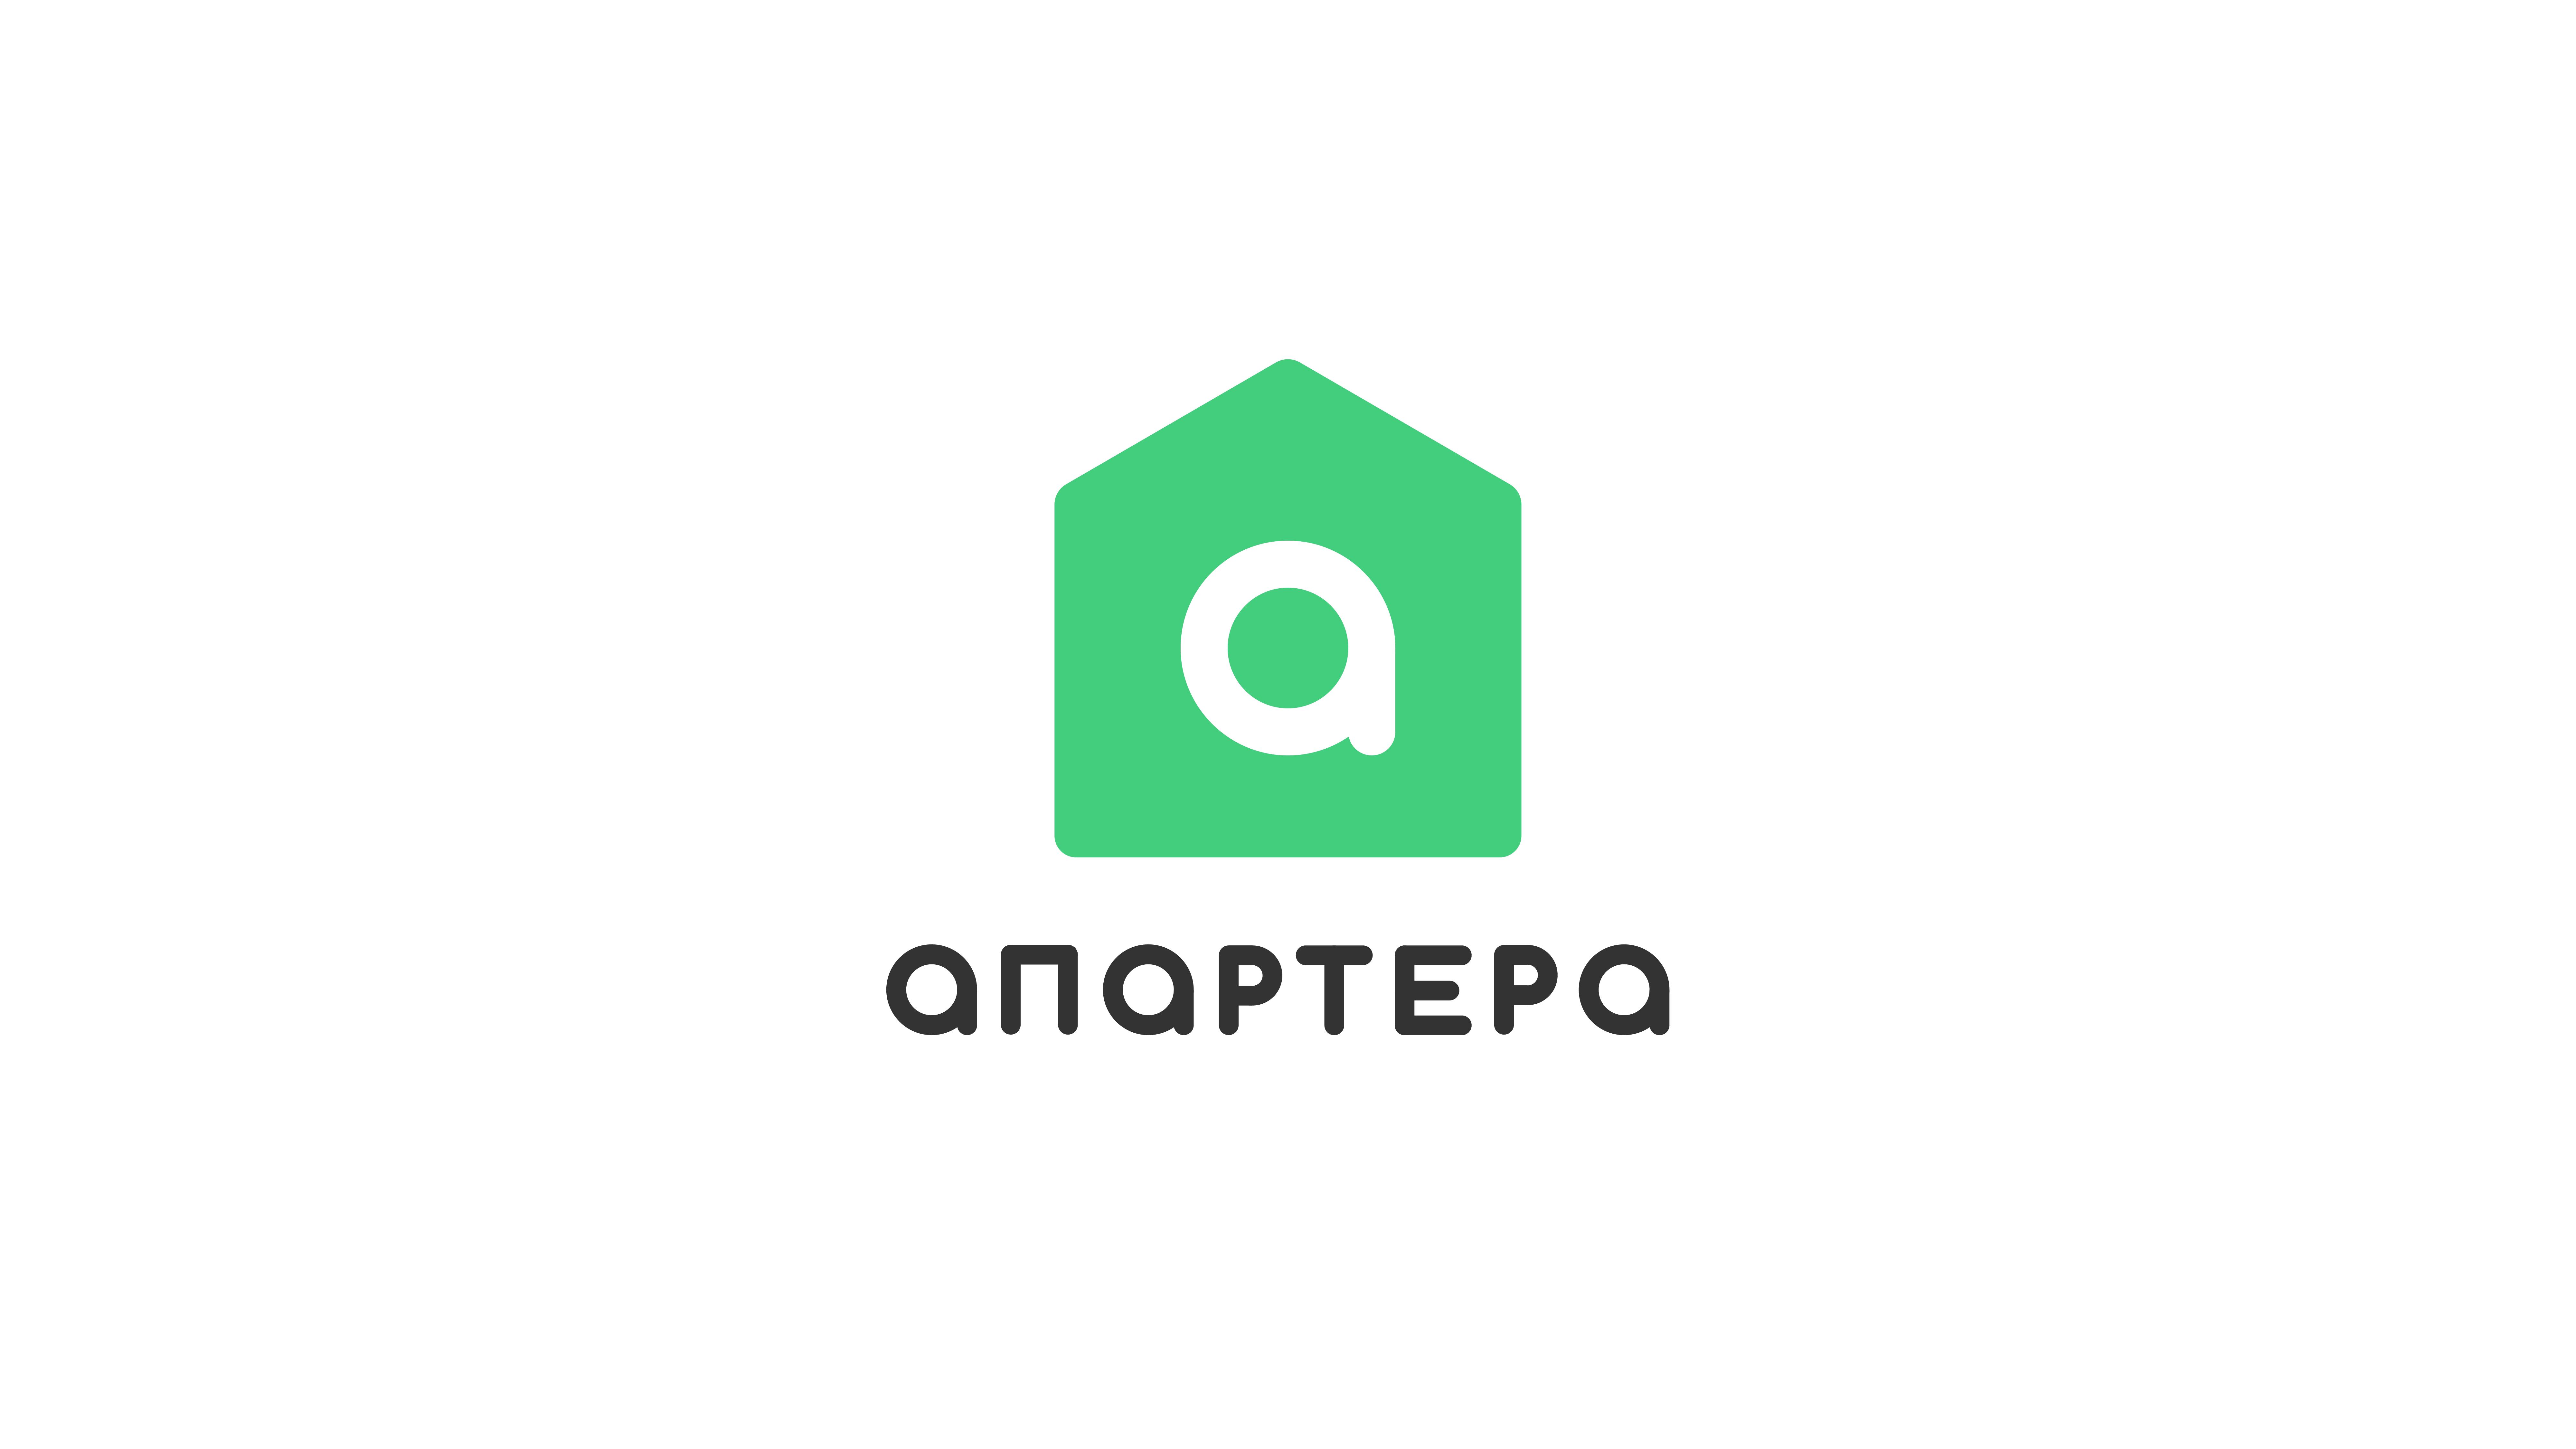 Логотип для управляющей компании  фото f_8785b728b1852fa7.png